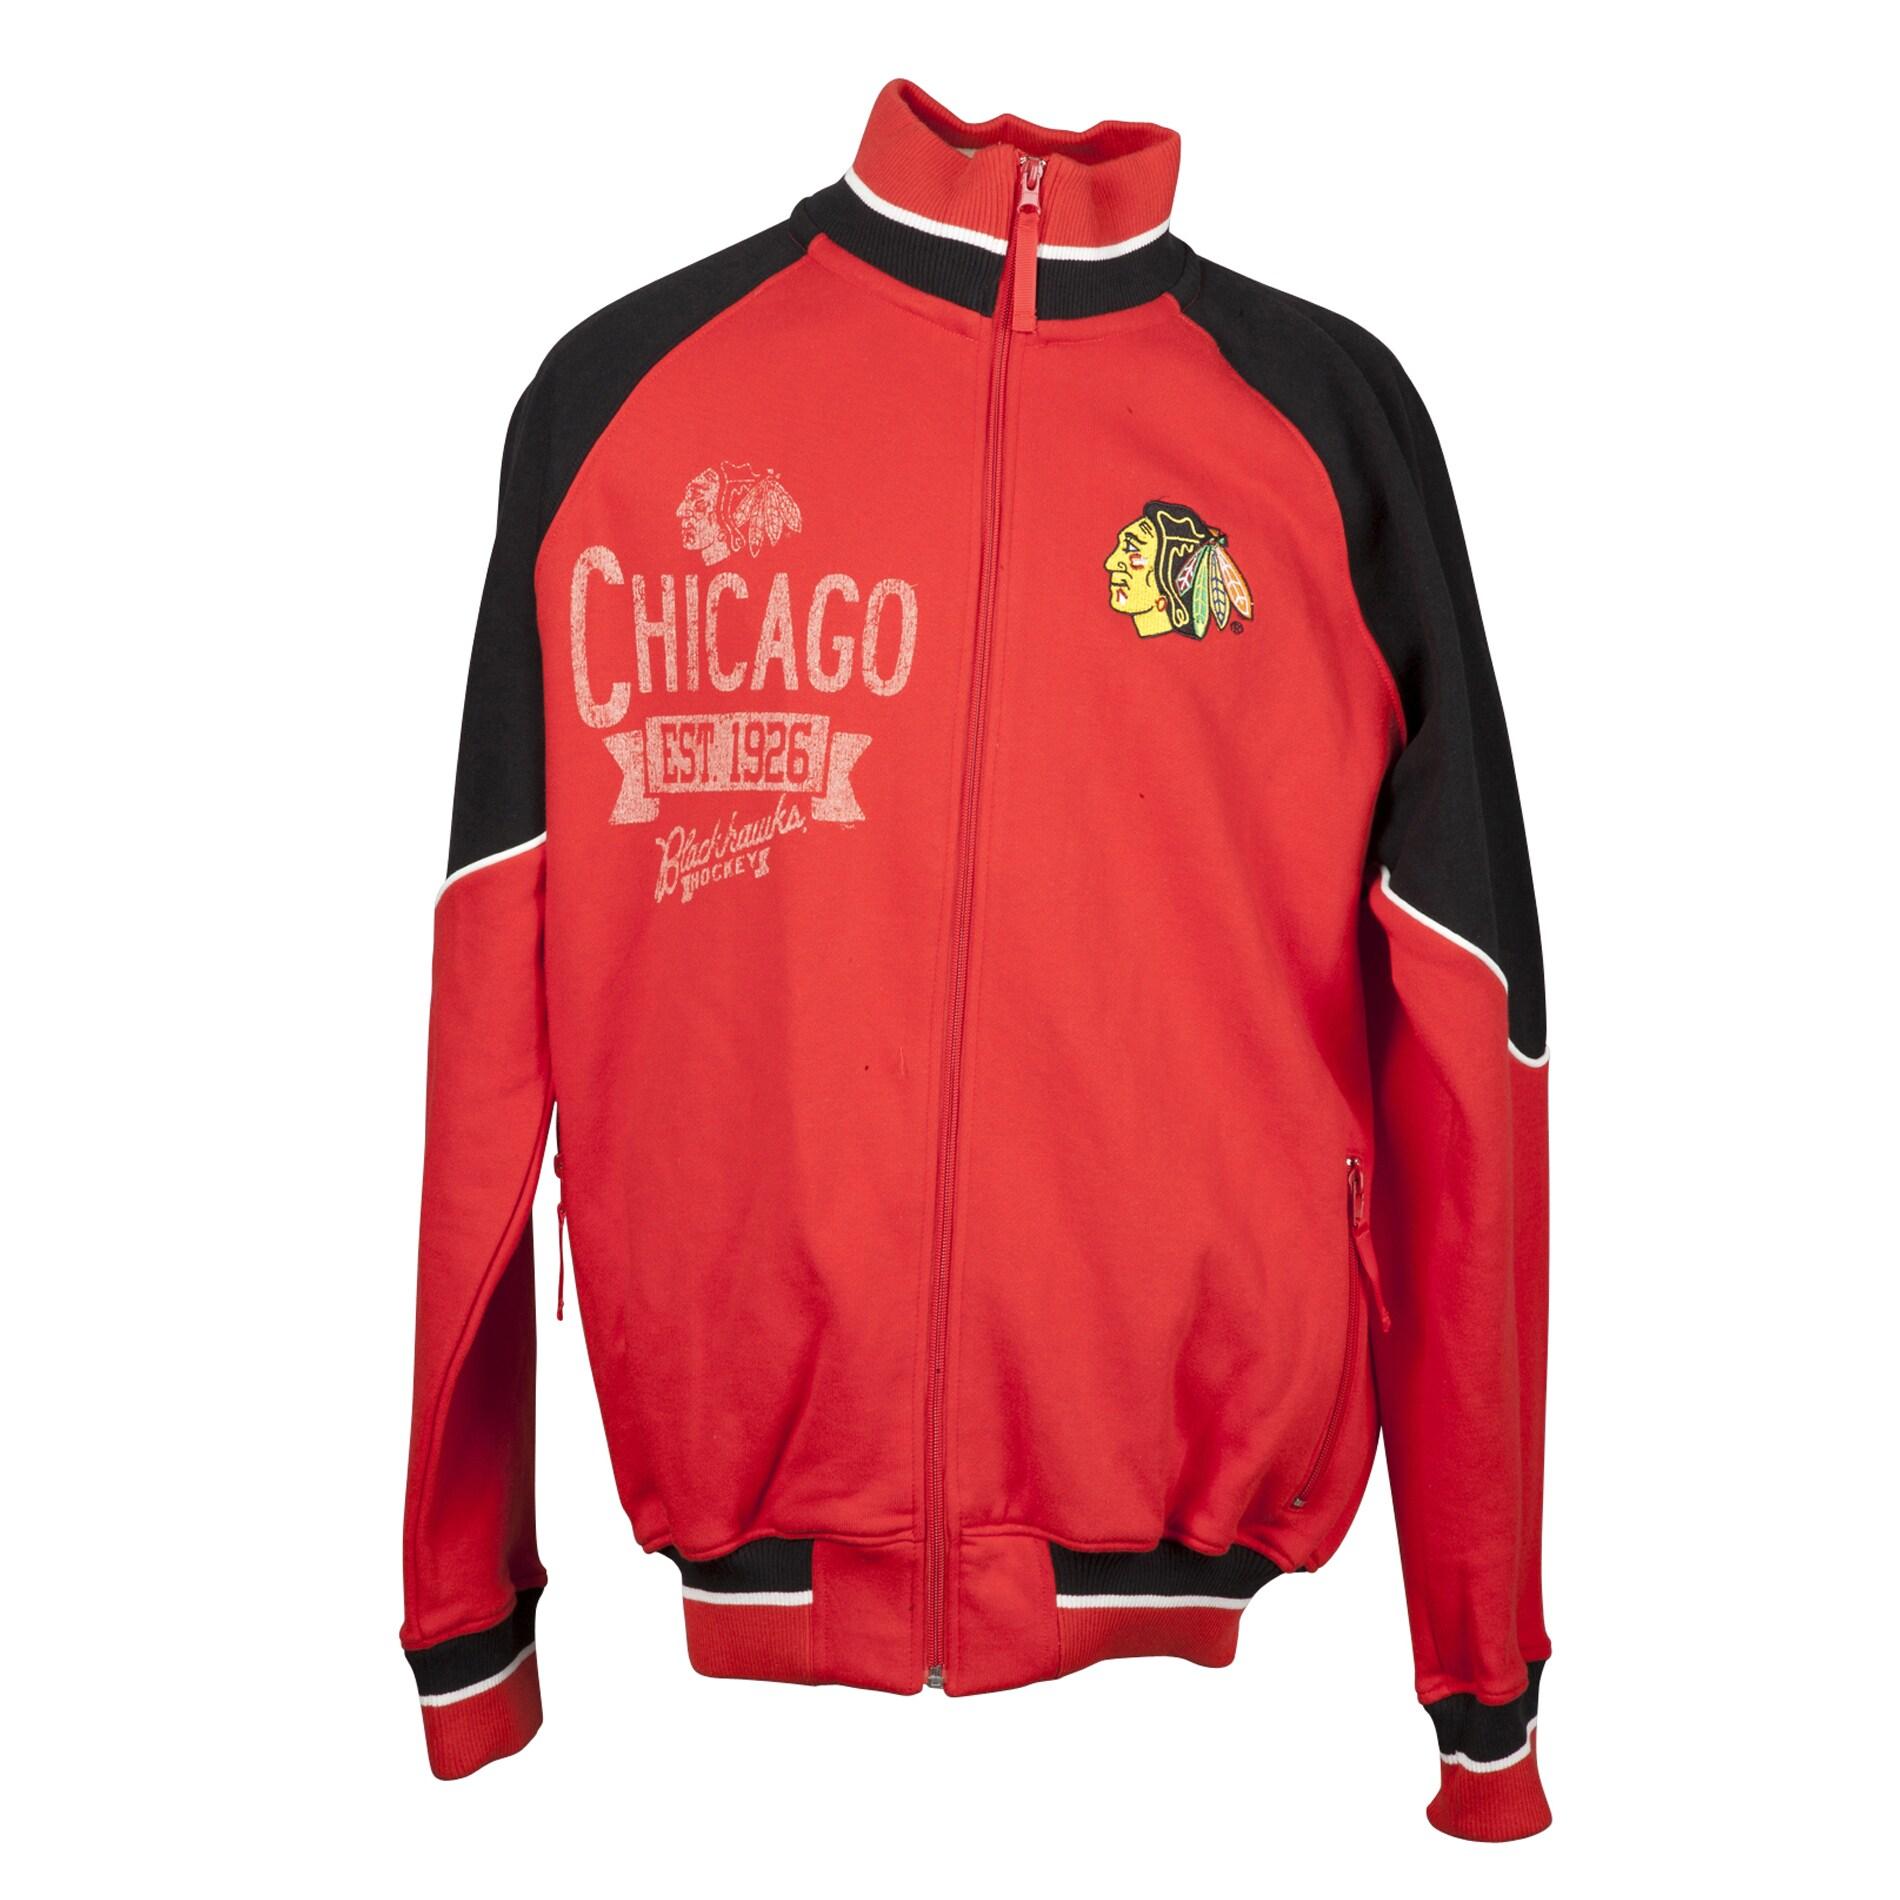 Chicago Blackhawks Full Zip Cotton Track Jacket